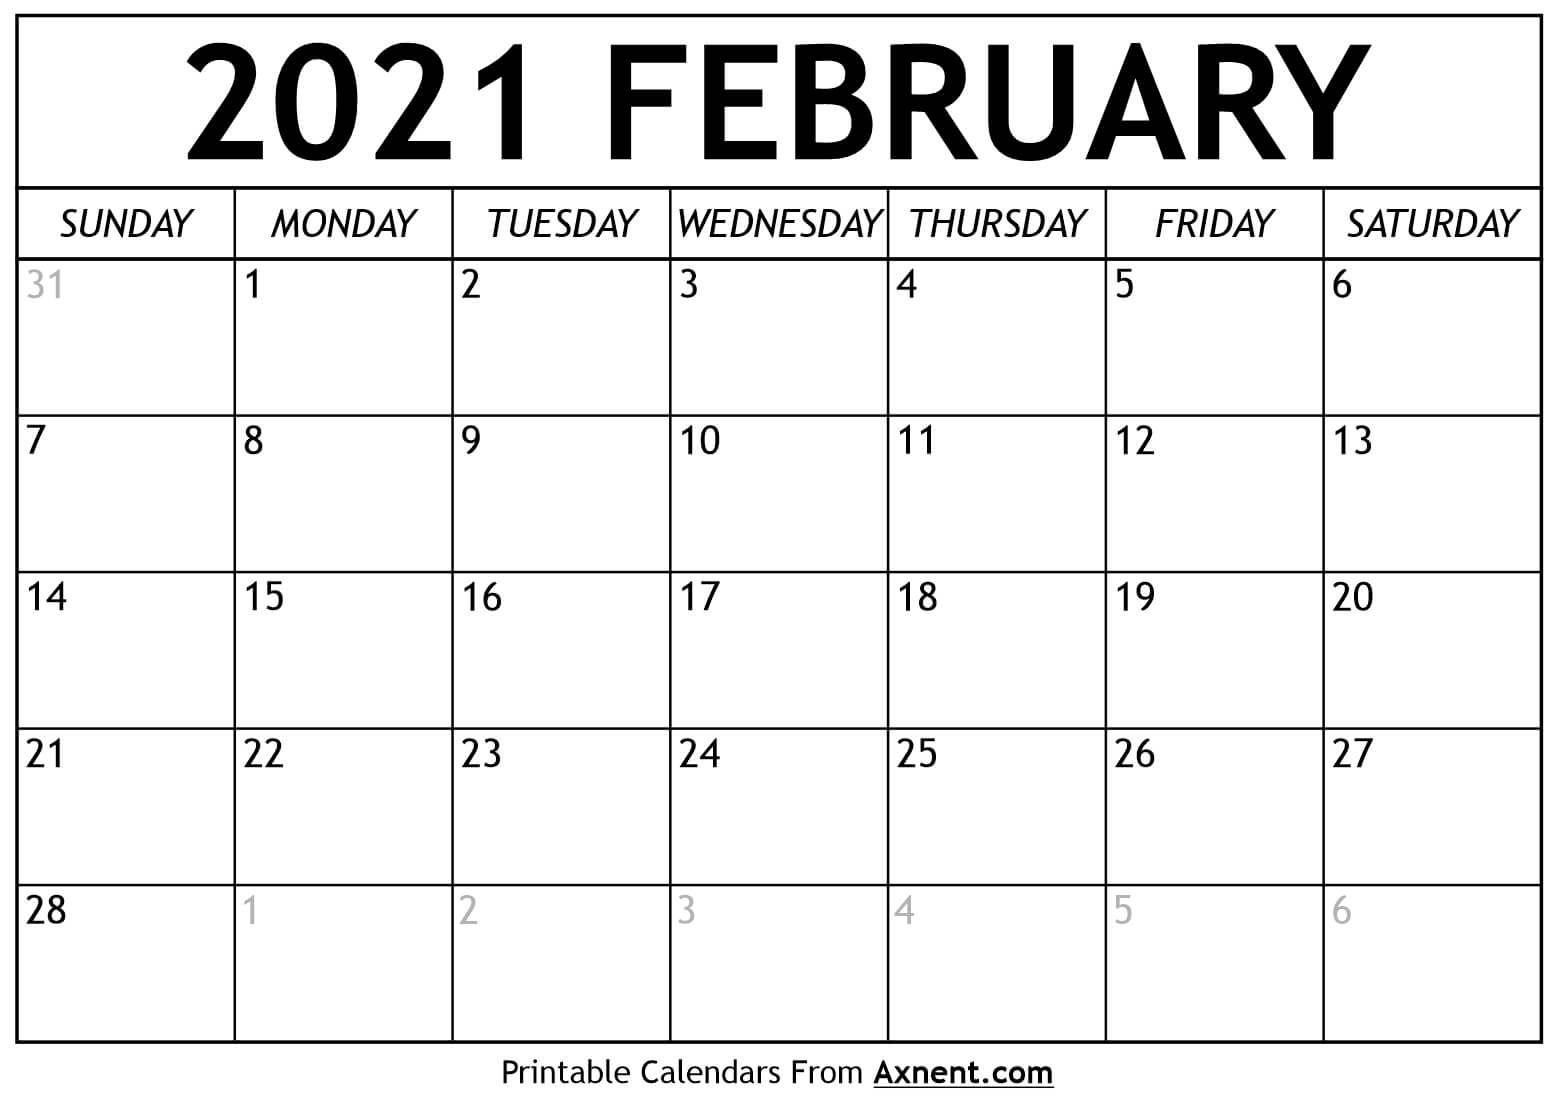 Printable February 2021 Calendar Template - Time Management